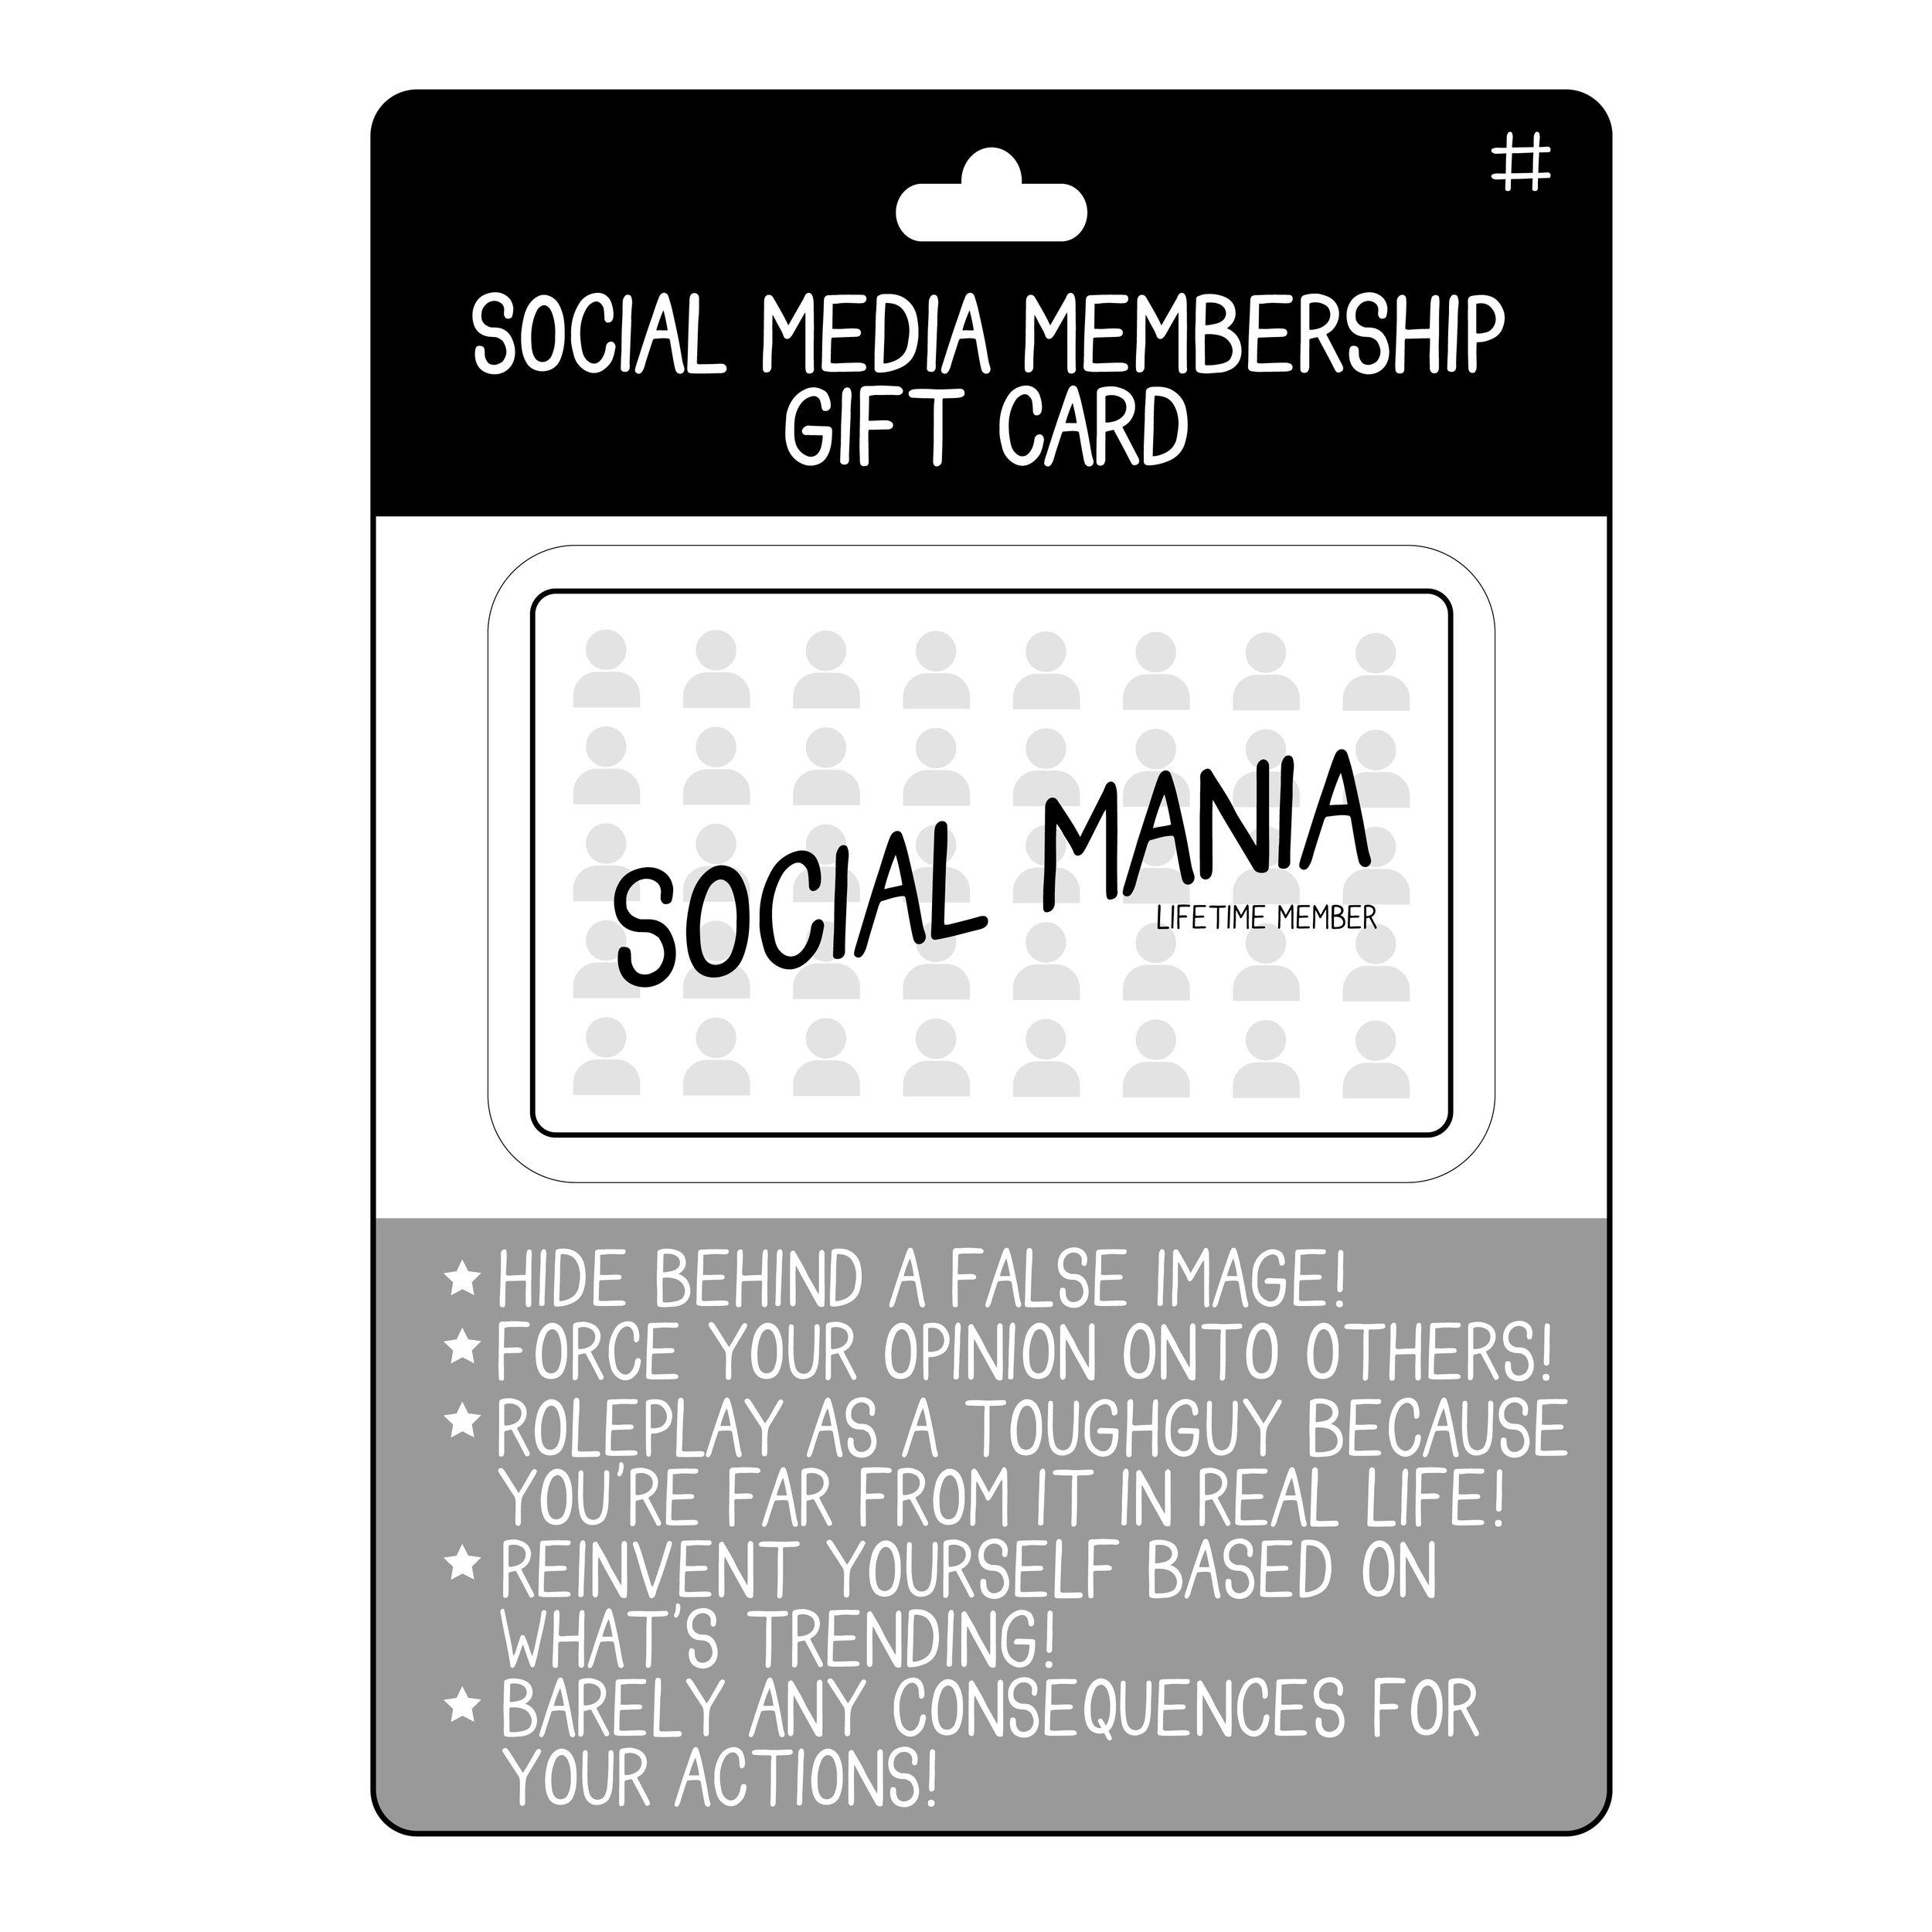 socialmediamembership-01.jpg